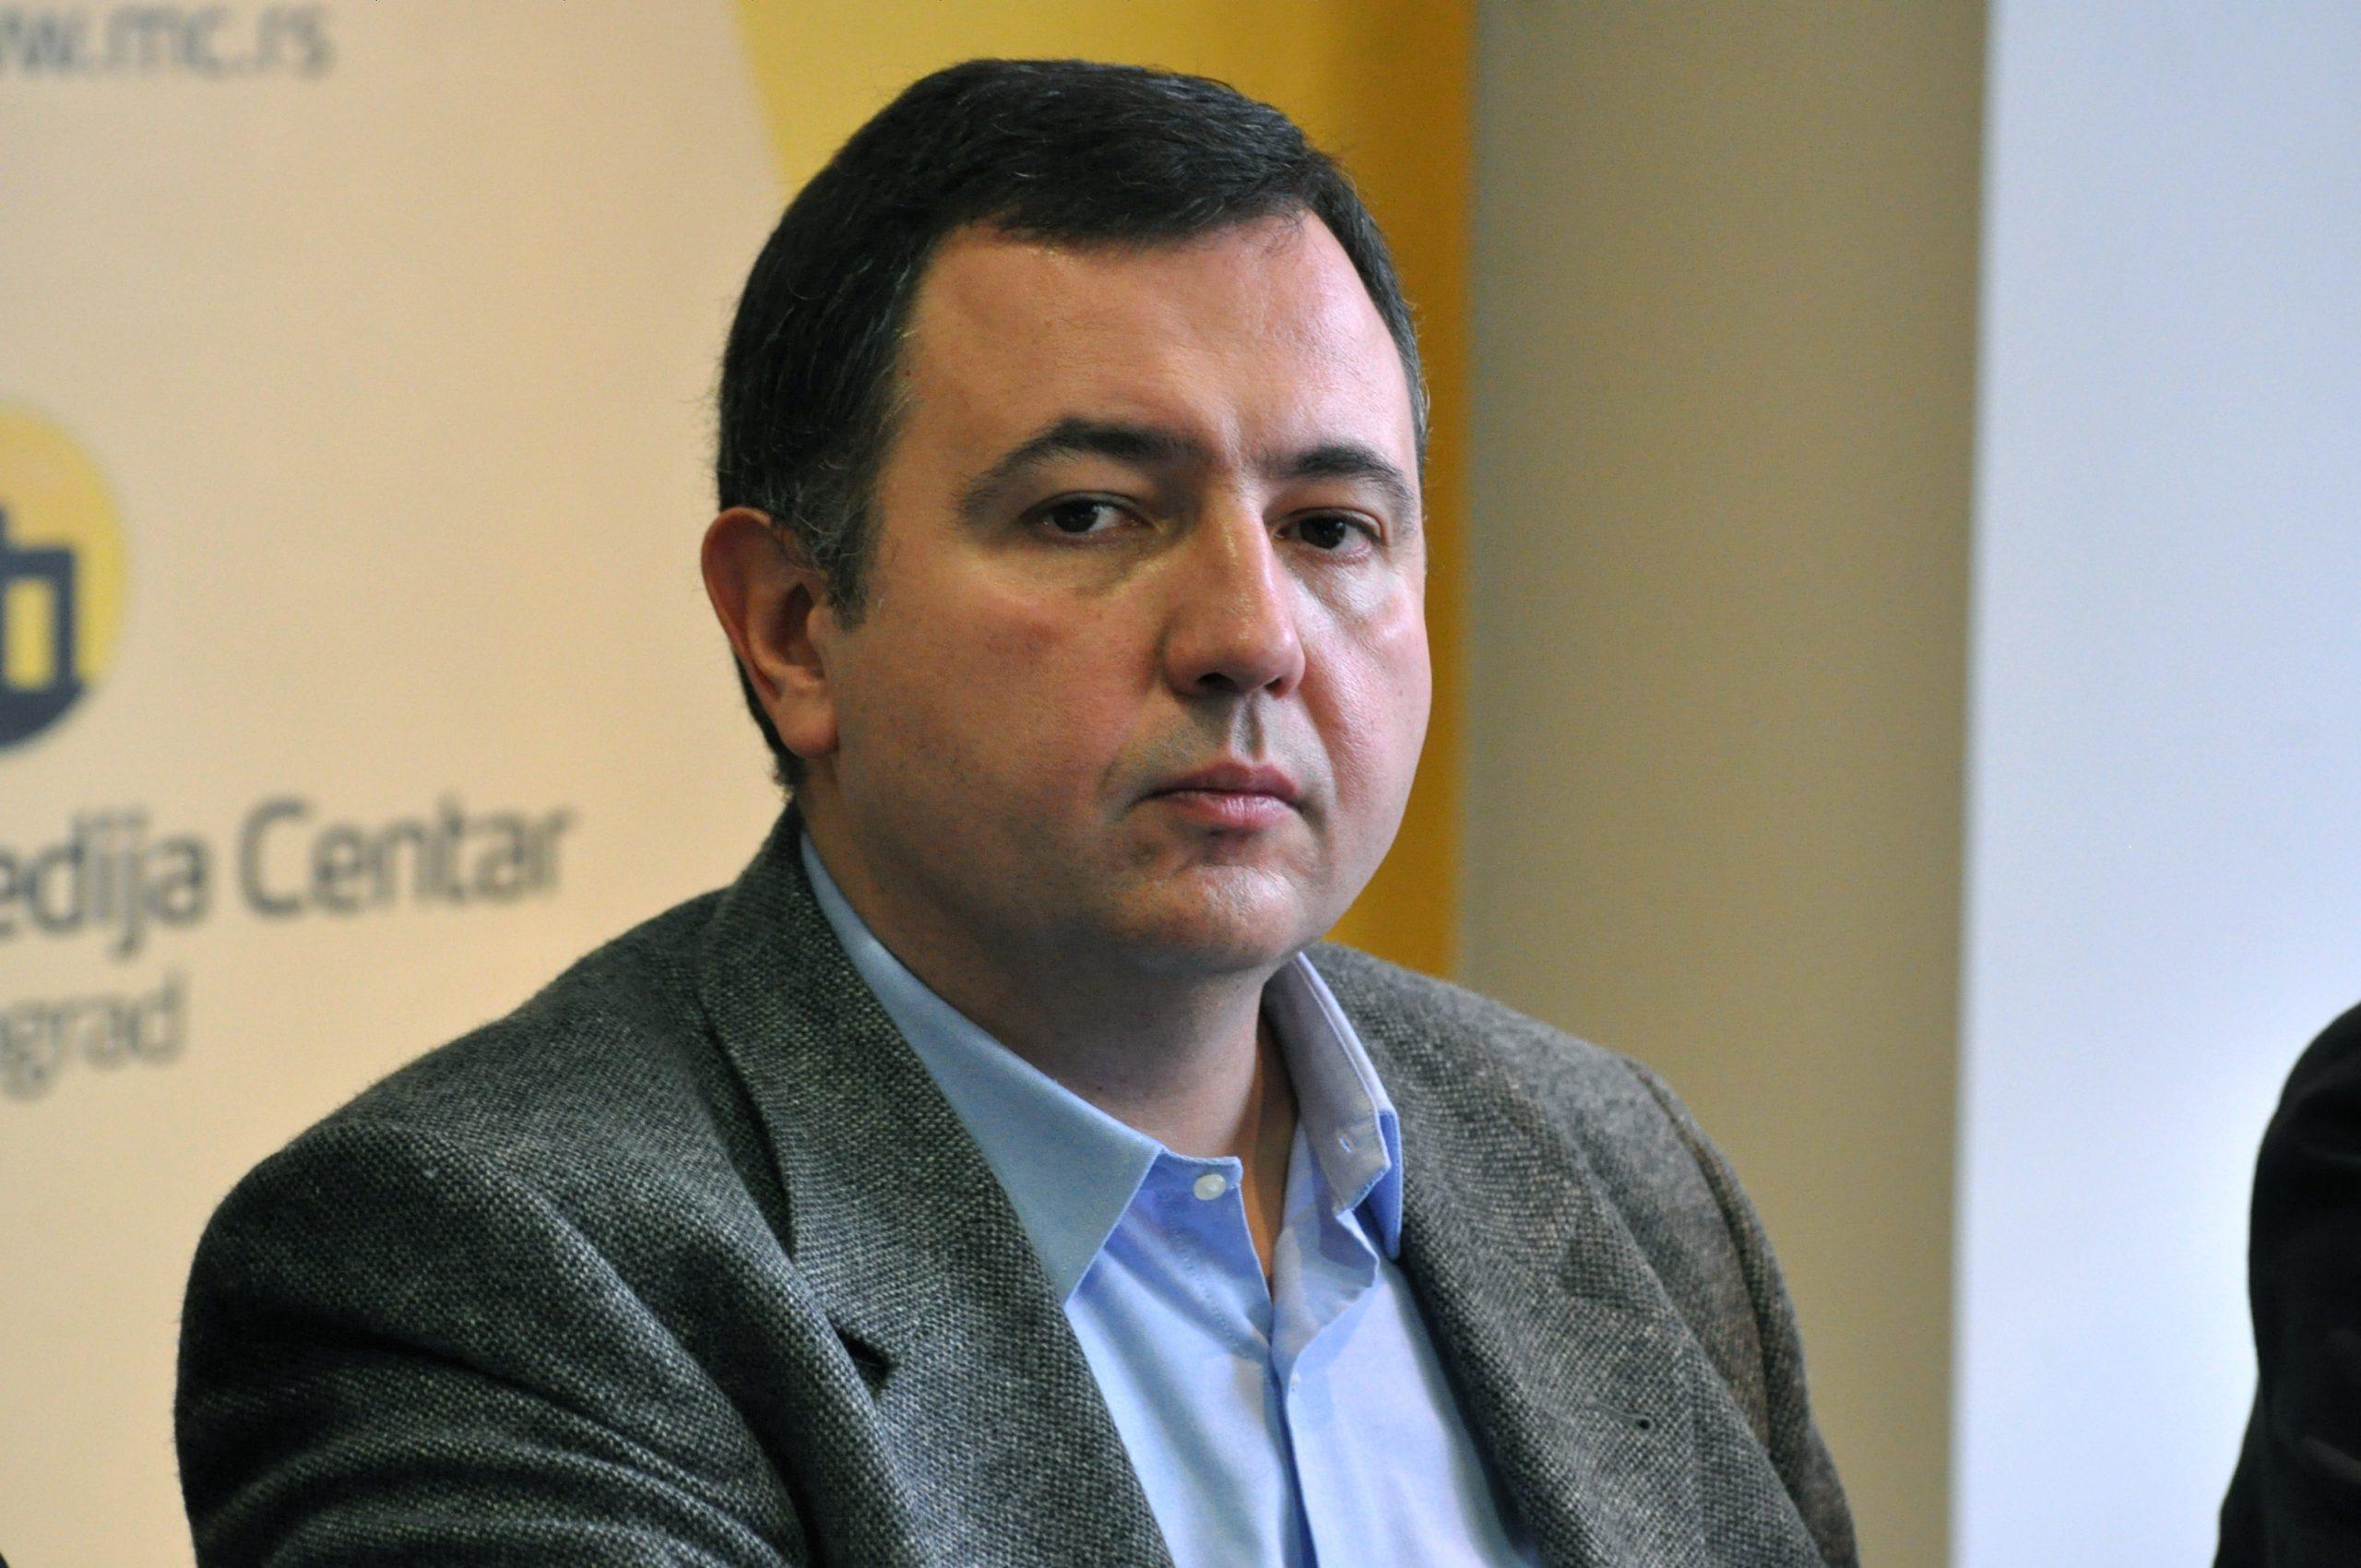 dragomir andjelkovic